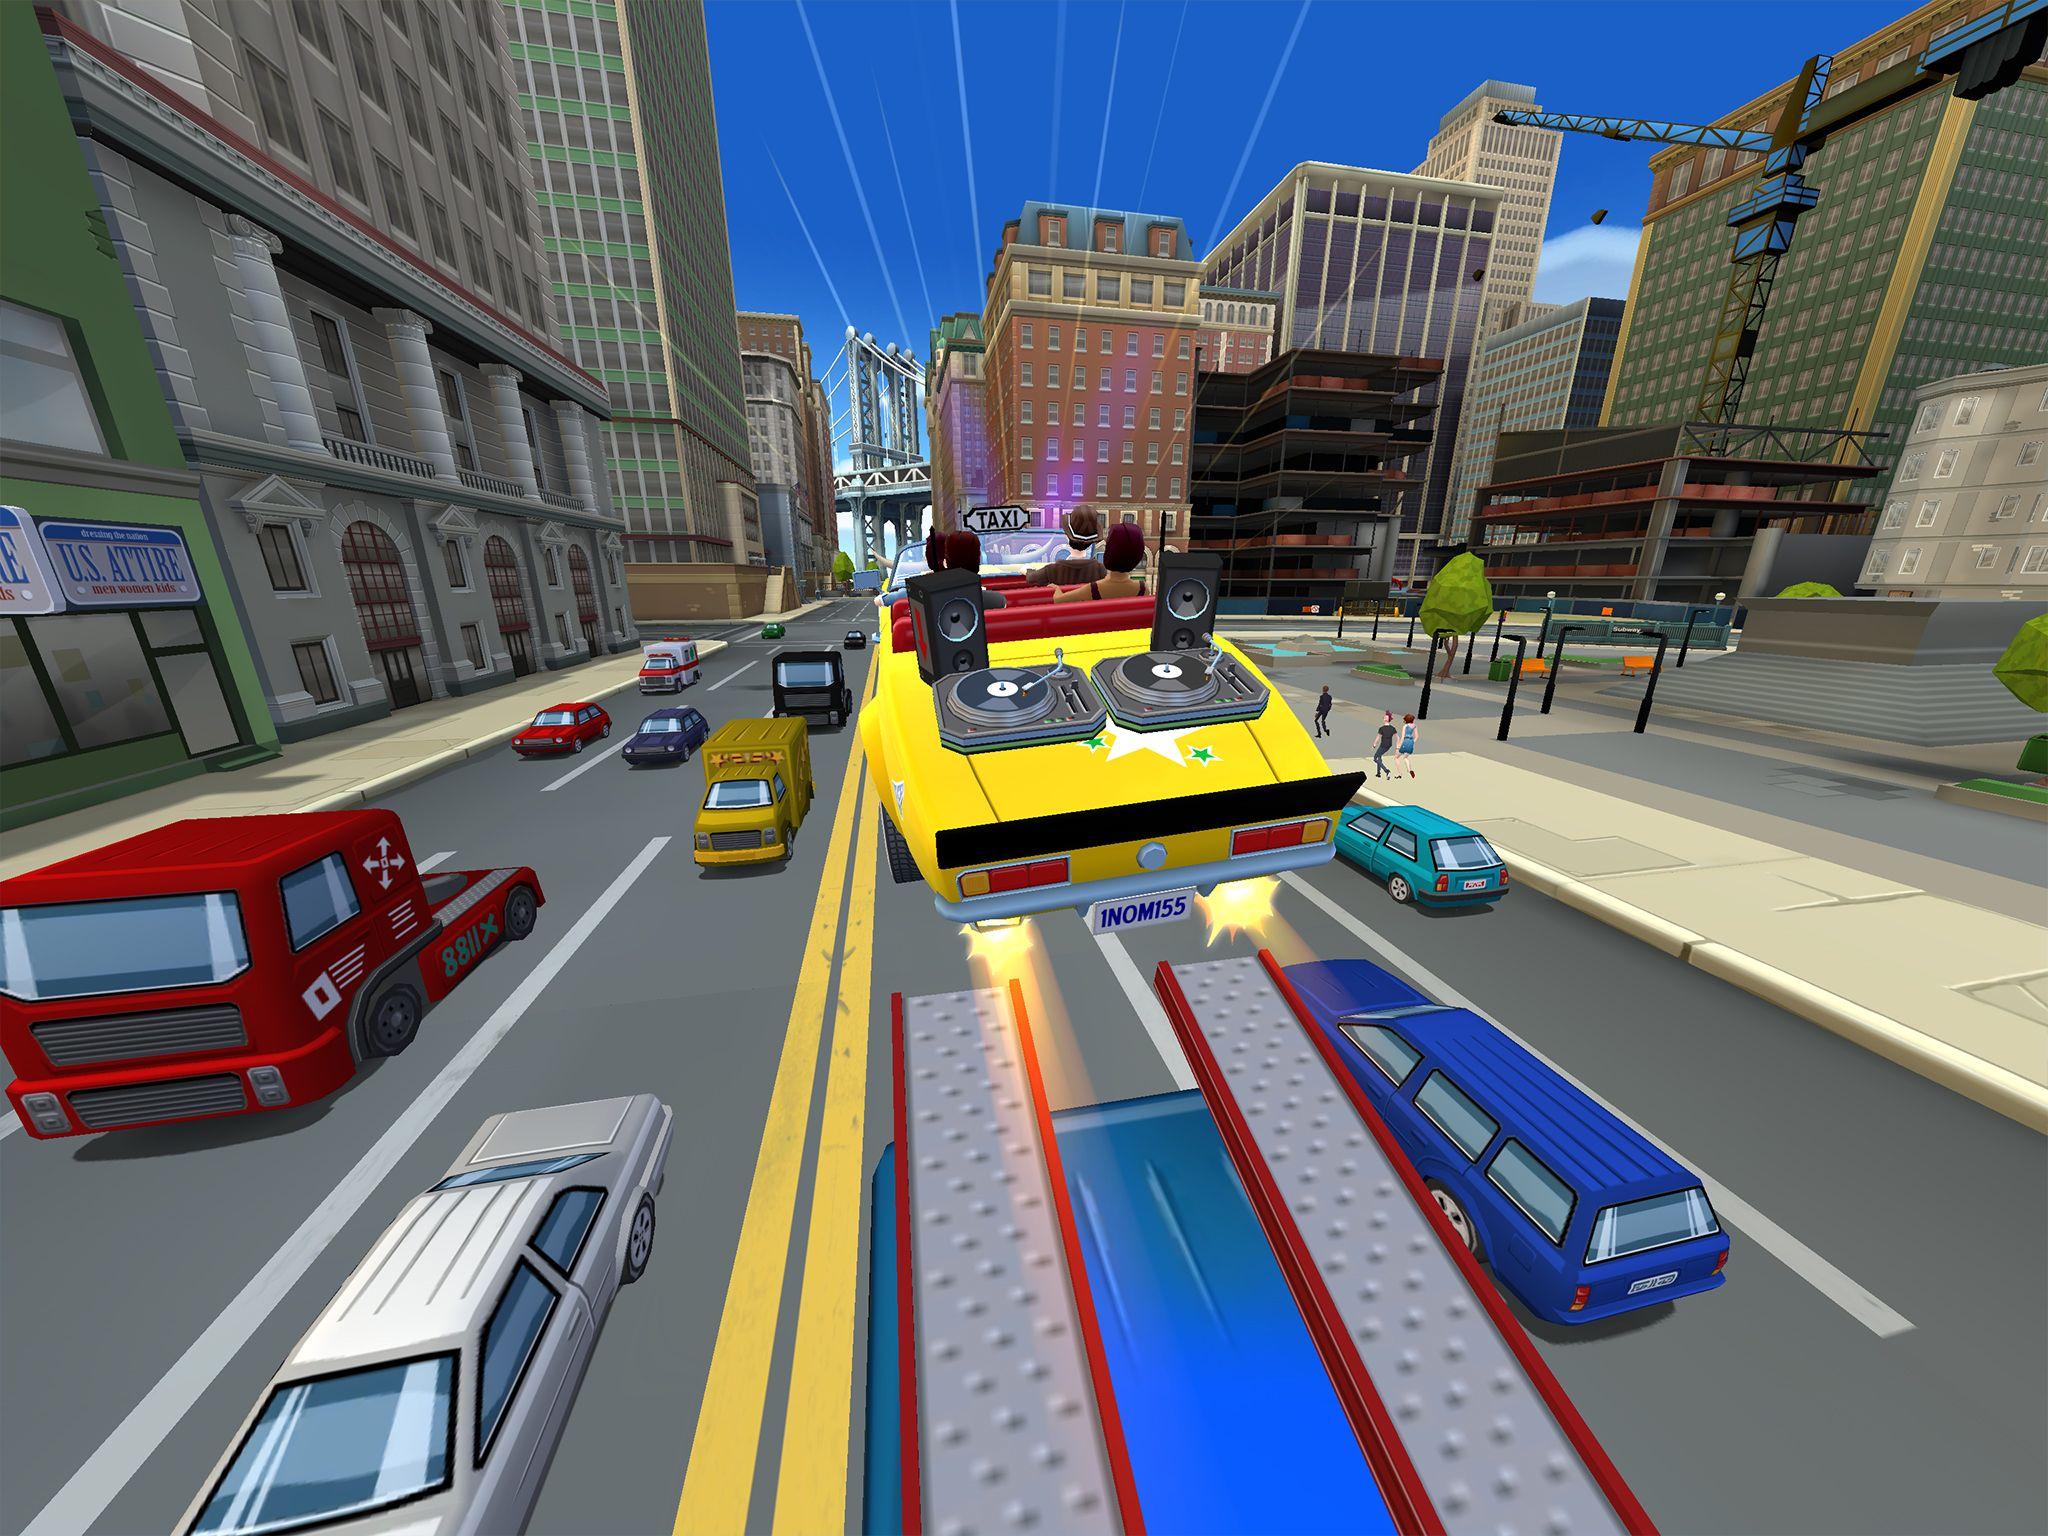 crazy-taxi-city-rush-ipad-screenshot-001.jpg